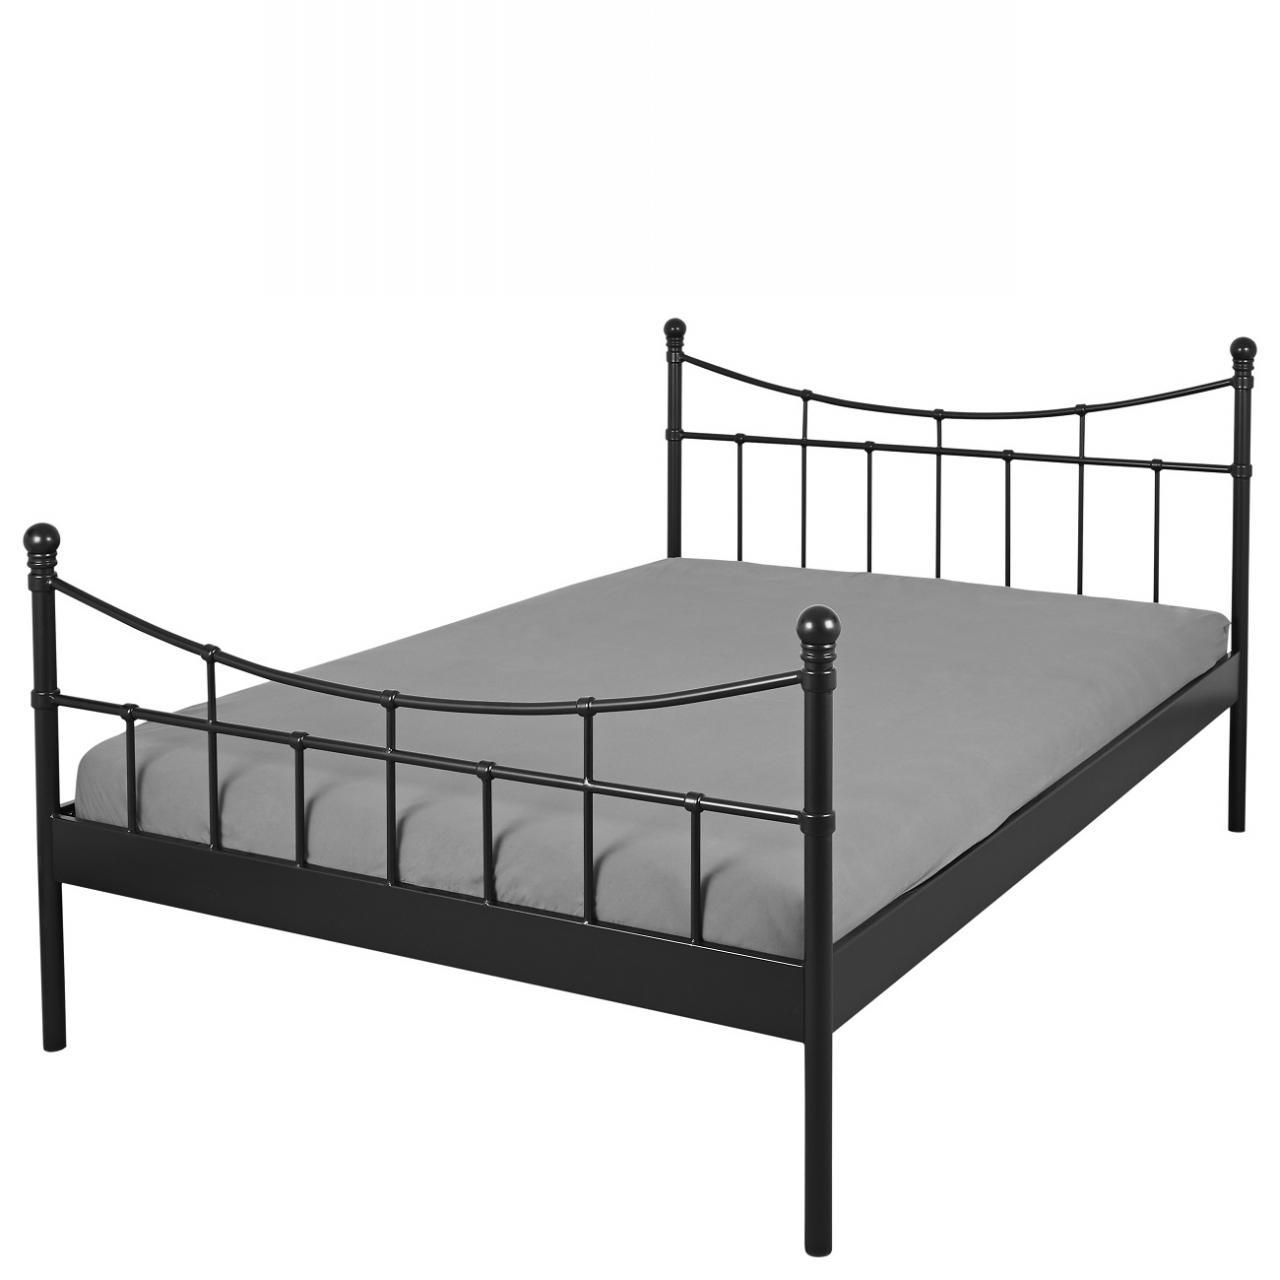 Full Size of Bett Doppelbett Ramona 180x200 Schwarz Bettgestell Metall Ausziehbar Betten überlänge Antik Teenager Liegehöhe 60 Cm Dormiente Mit Unterbett Mädchen Cars Bett Bett Metall